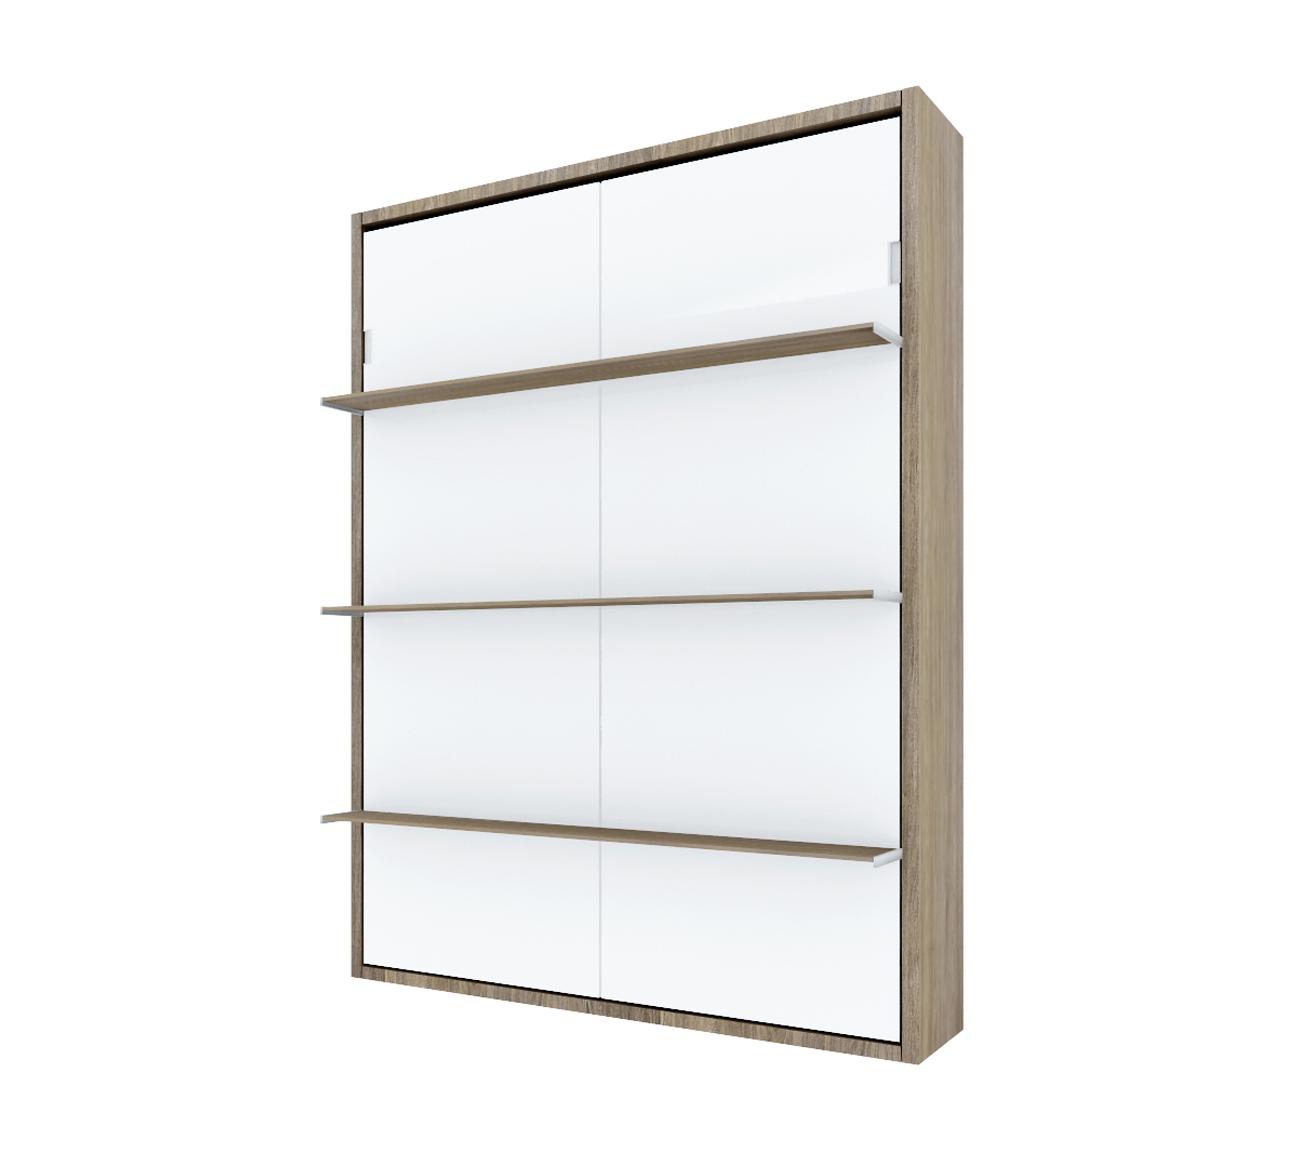 Pat rabatabil vertical cu rafturi – SmartBed Book